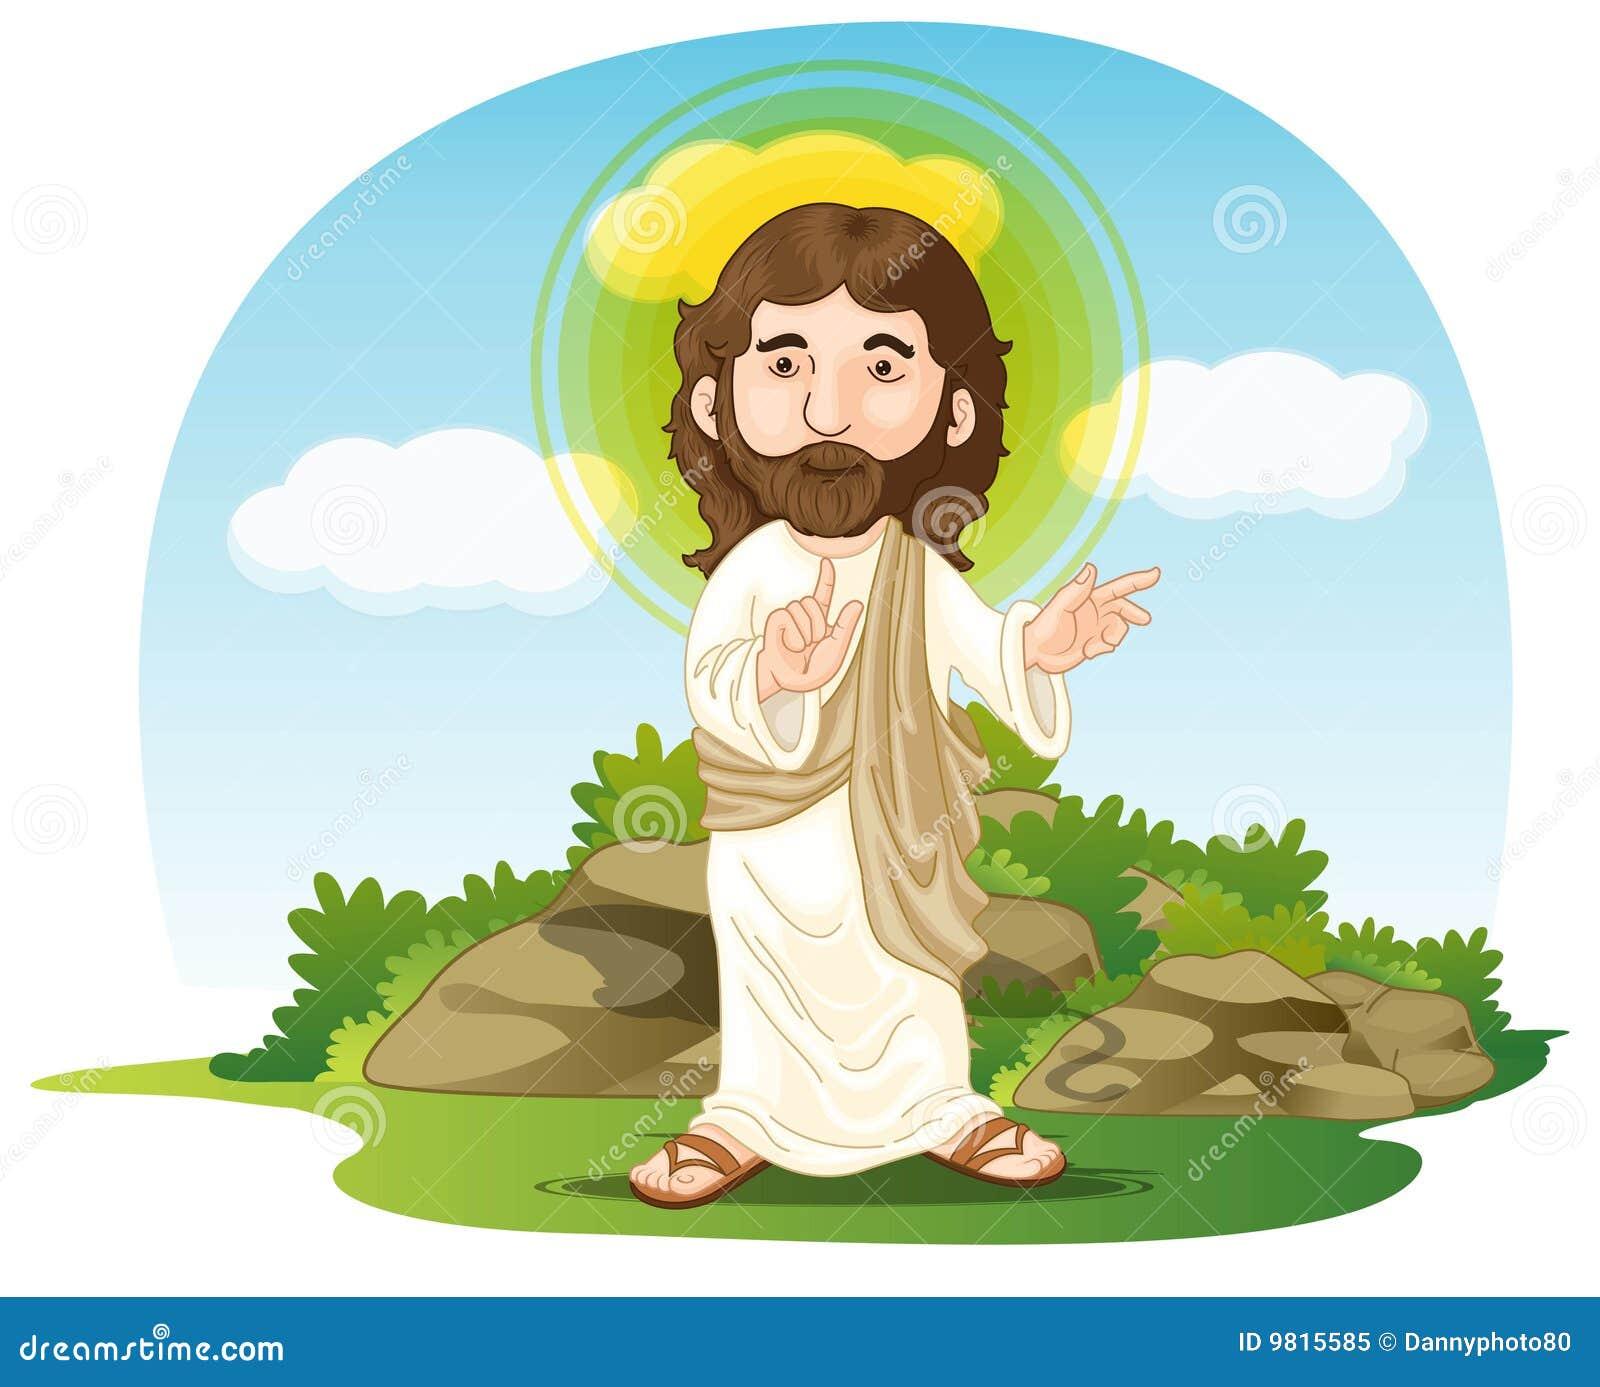 Jesus Royalty Free Stock Photo Image 9815585